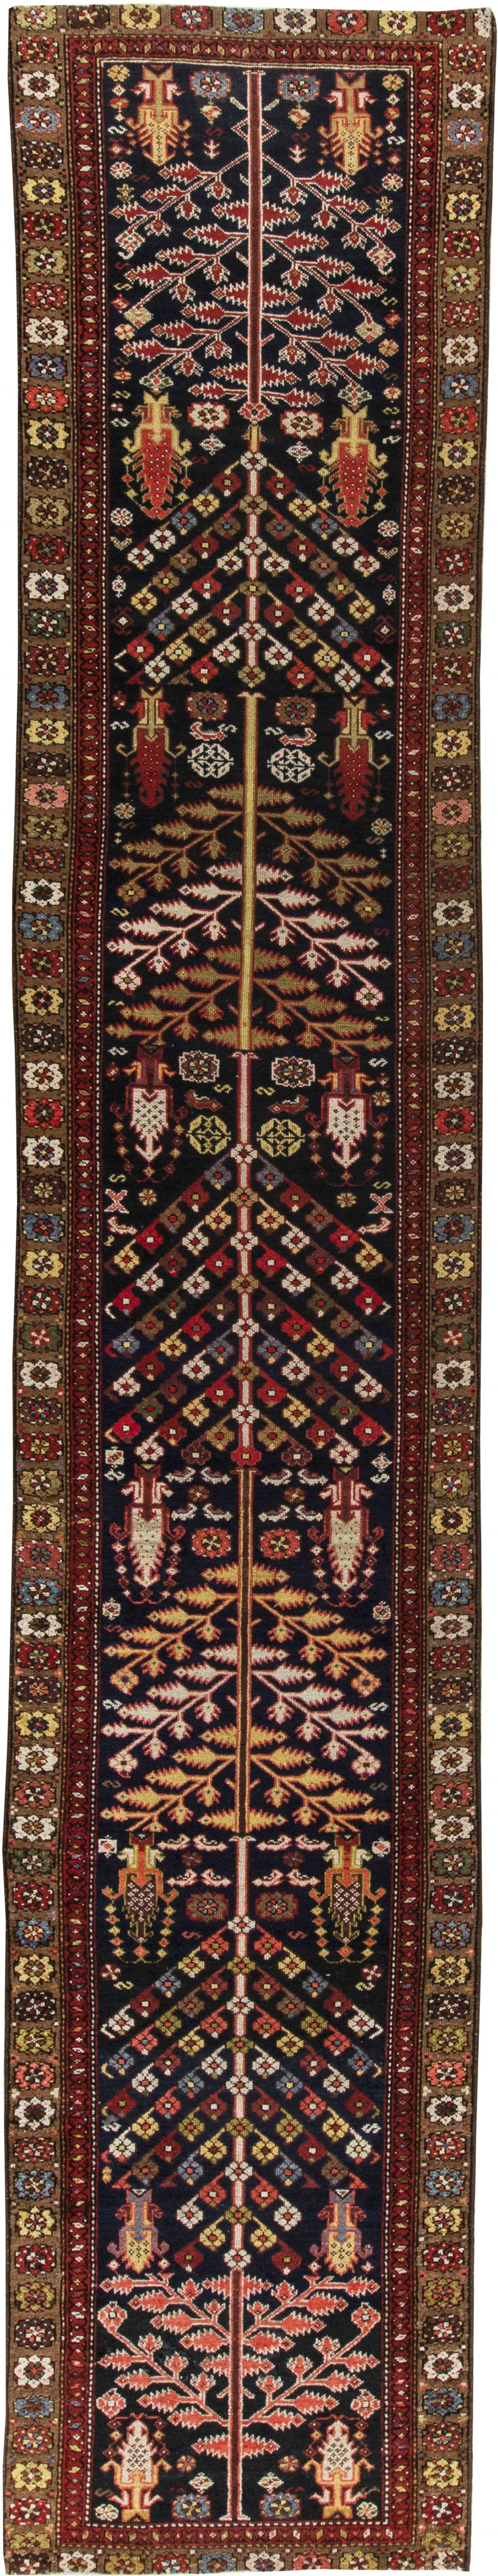 Antique Persian Bakshaish runner BB3162